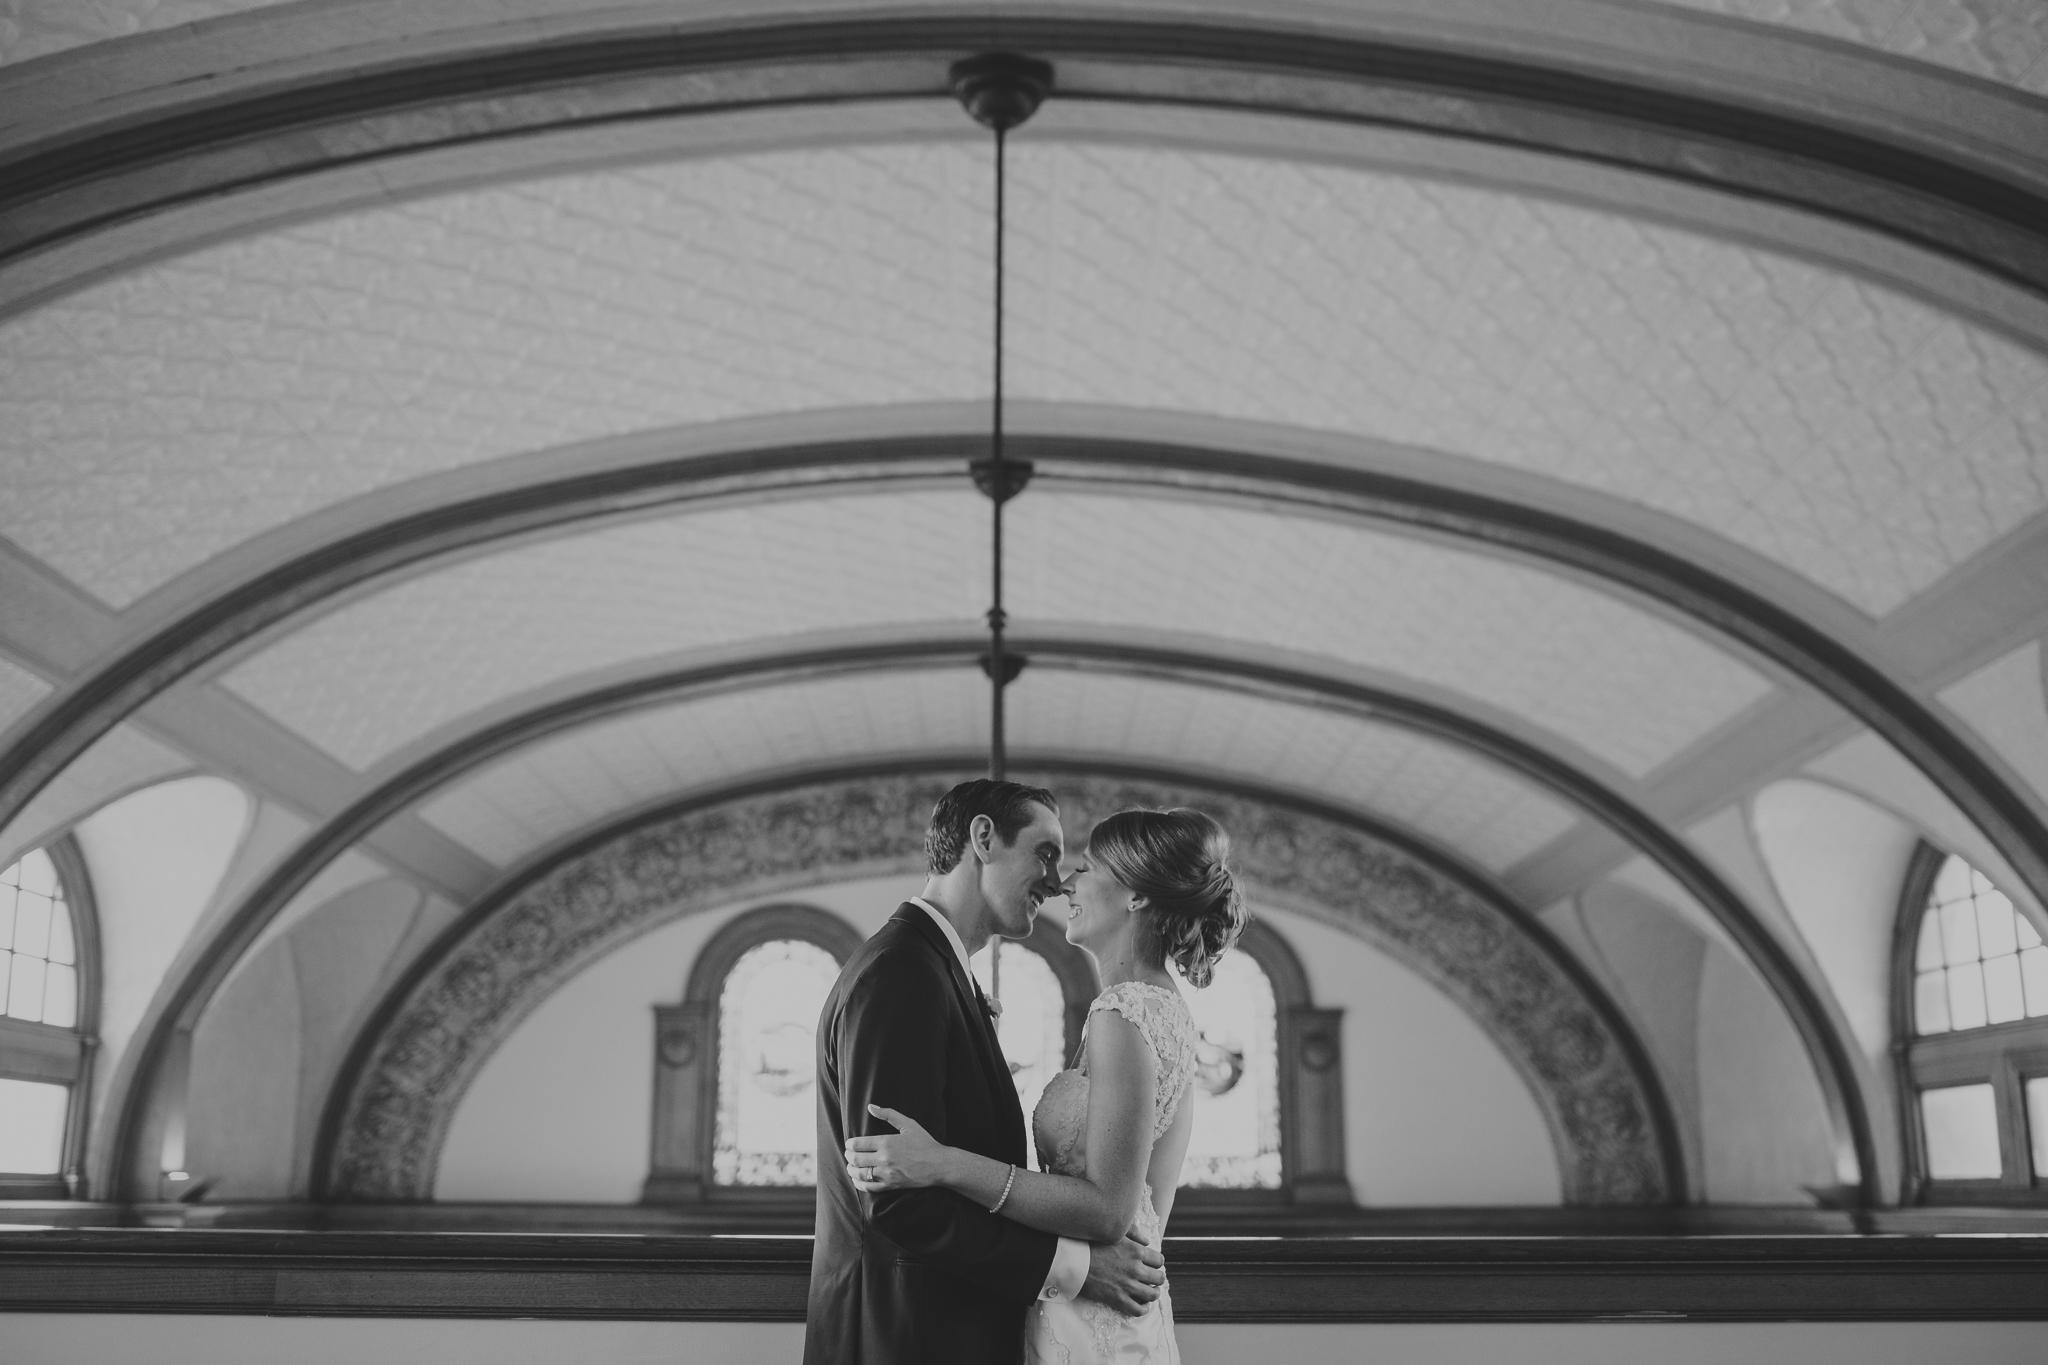 Michael and Kelly - the ashton depot - wedding DFW - wedding photographer- elizalde photography (74 of 150).jpg